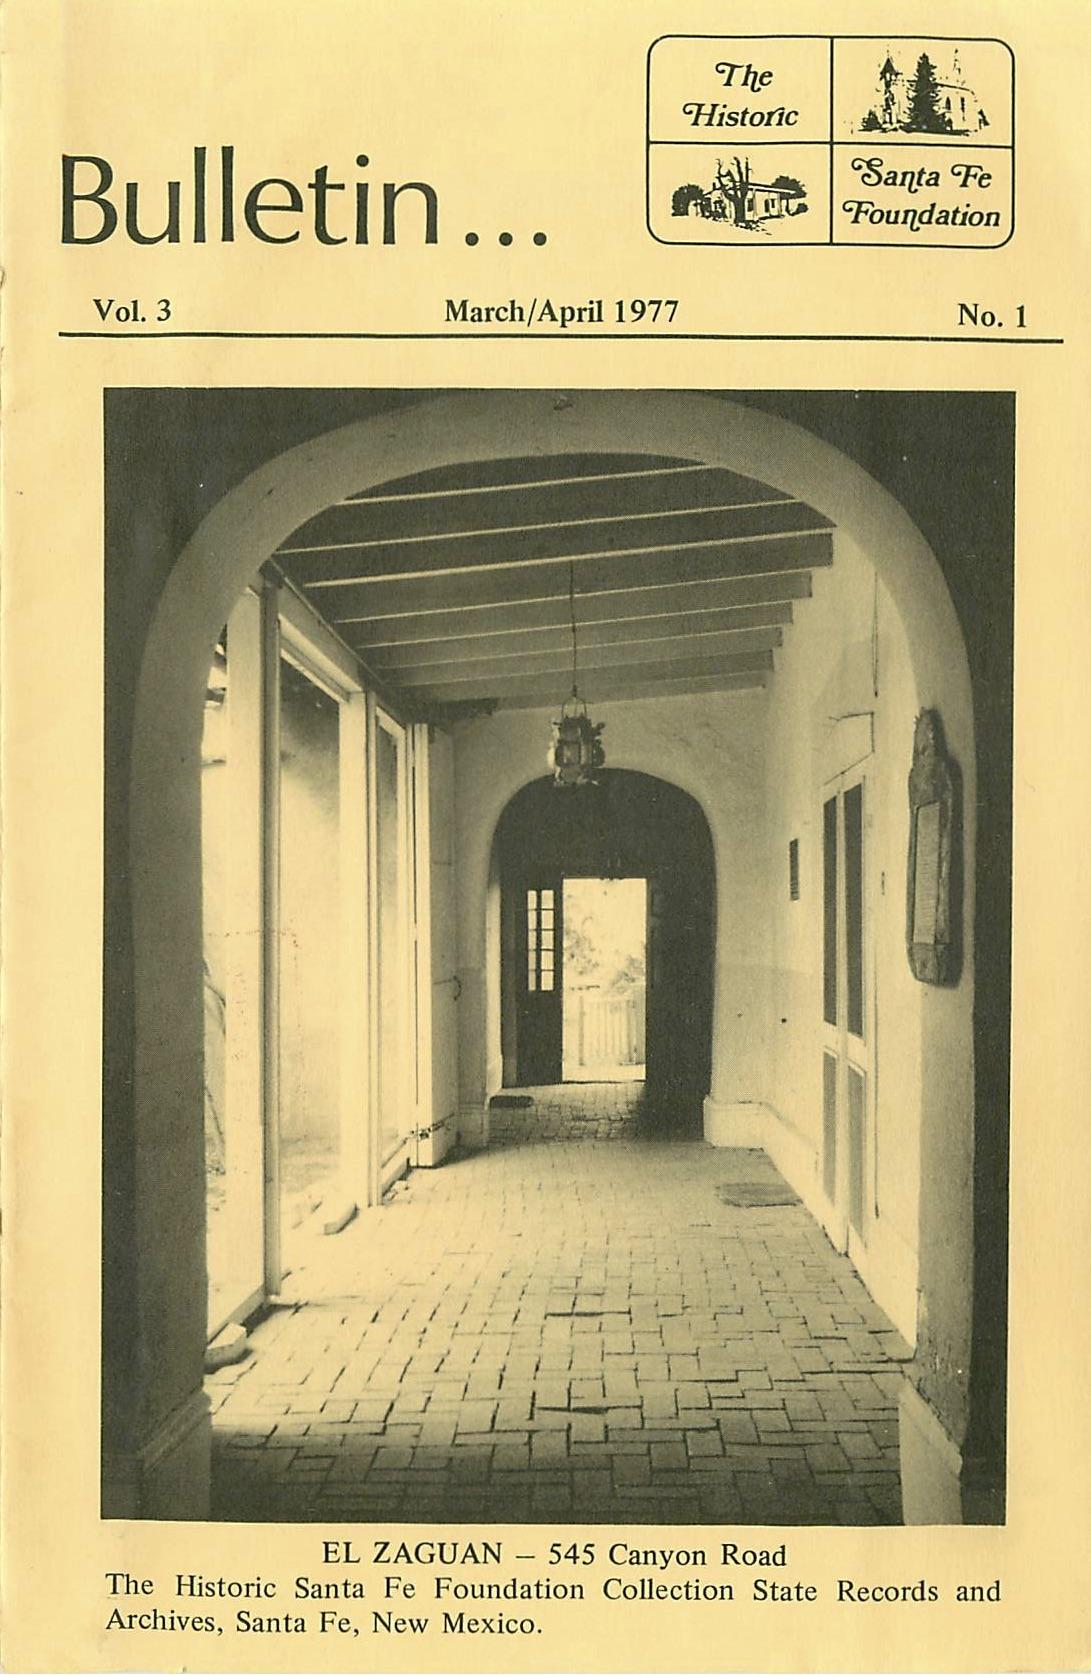 1977 HSFF Bulletin Vol.3 No.1Cover.jpg